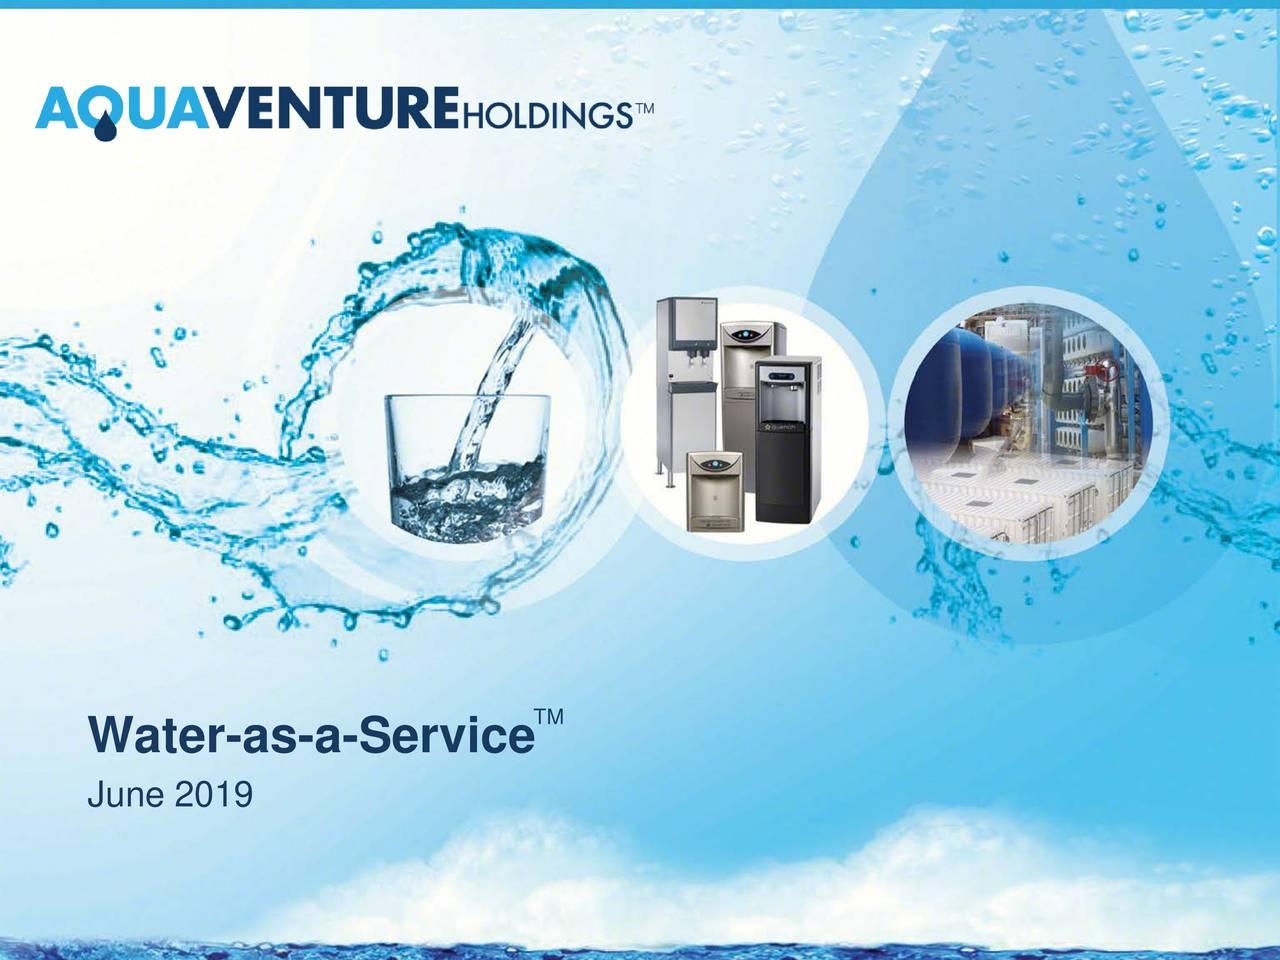 AquaVenture Holdings (WAAS) Investor Presentation - Slideshow